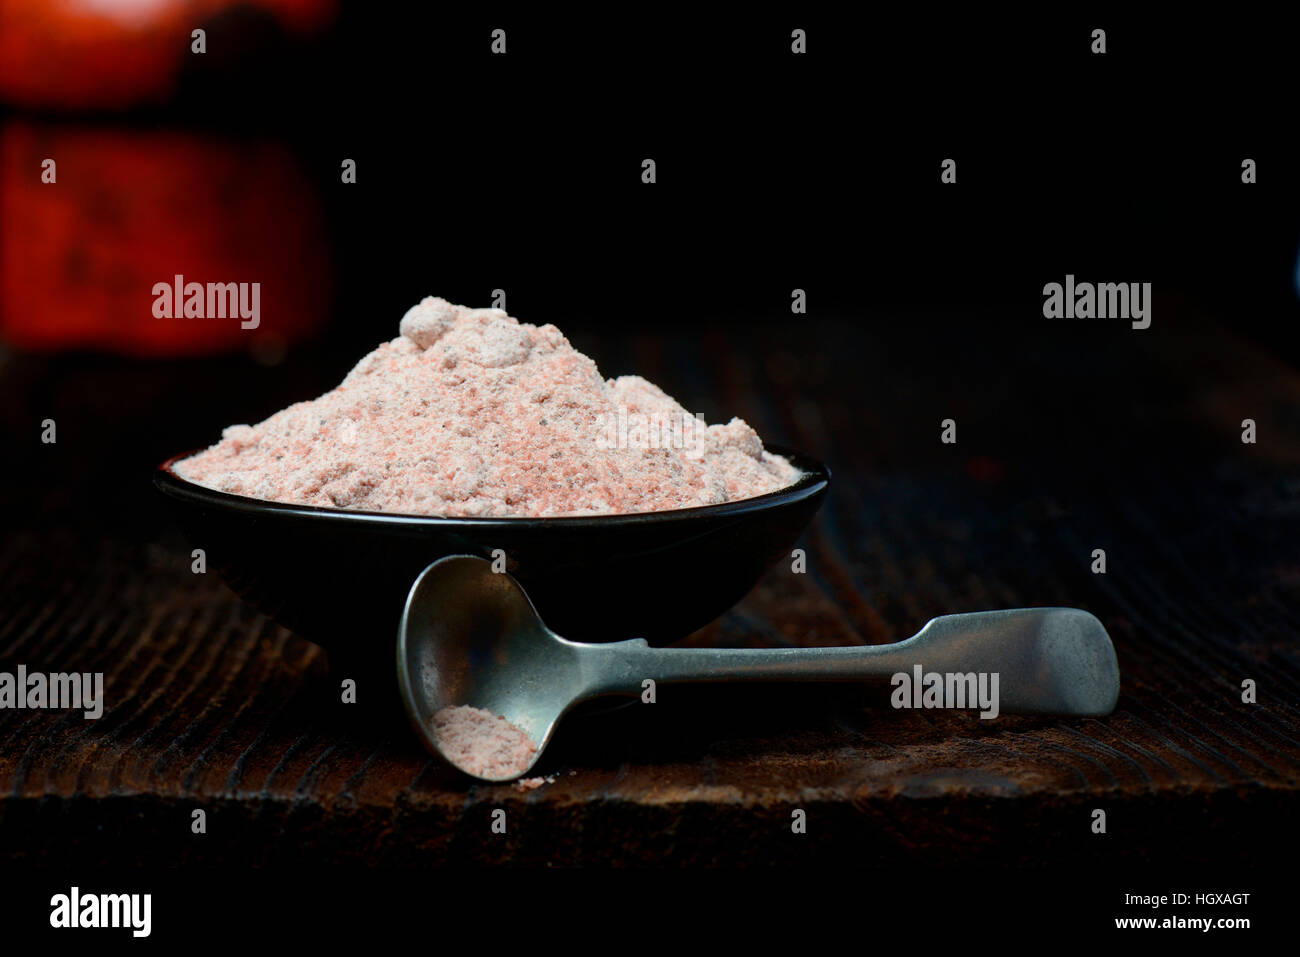 Kala Namak, Gemahlenes Salz Mit Loeffelchen in Schale, Indisches Salz, Schwarzsalz, Schwarzes Salz, Indien Stockbild